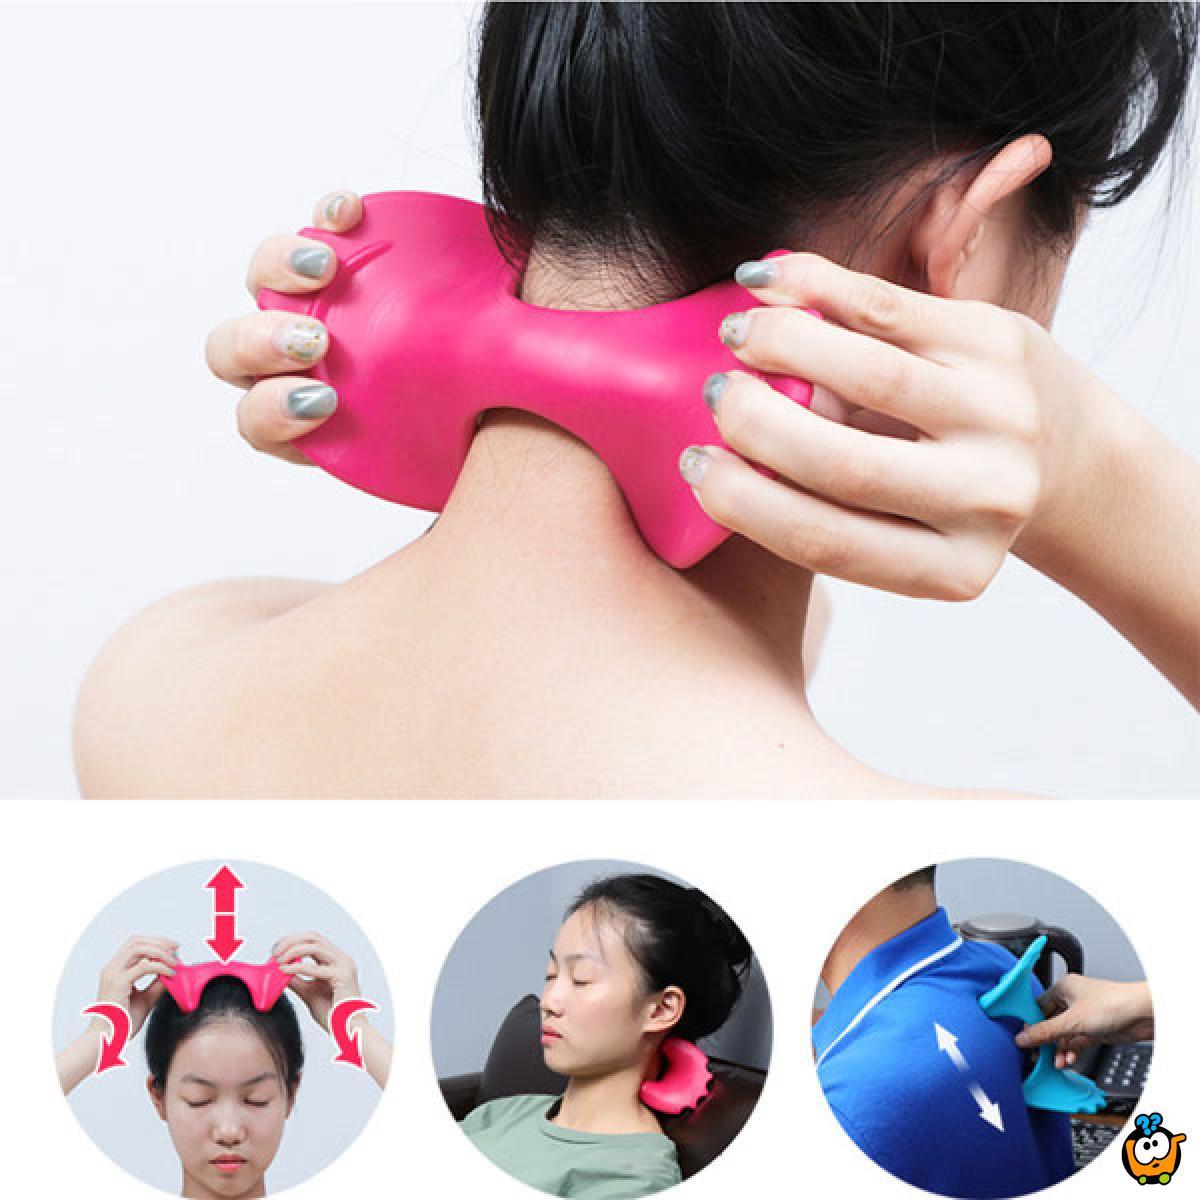 Neck relaxing massager – Fleksibilni masazer za vrat